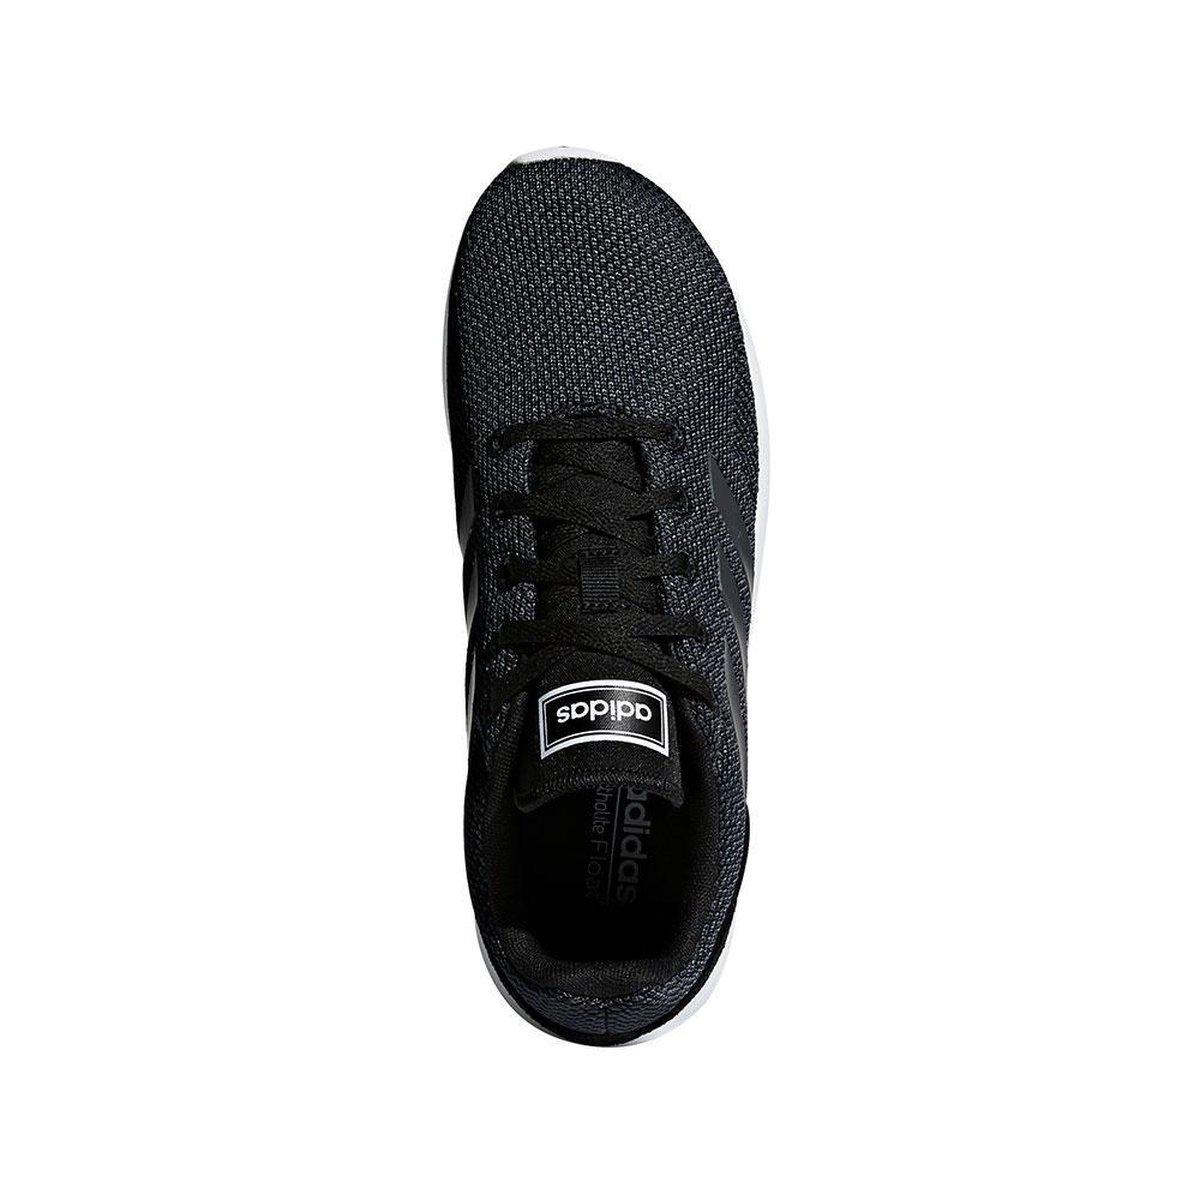 Adidas Run 70s sneakers dames zwartwit   Fitness Geest